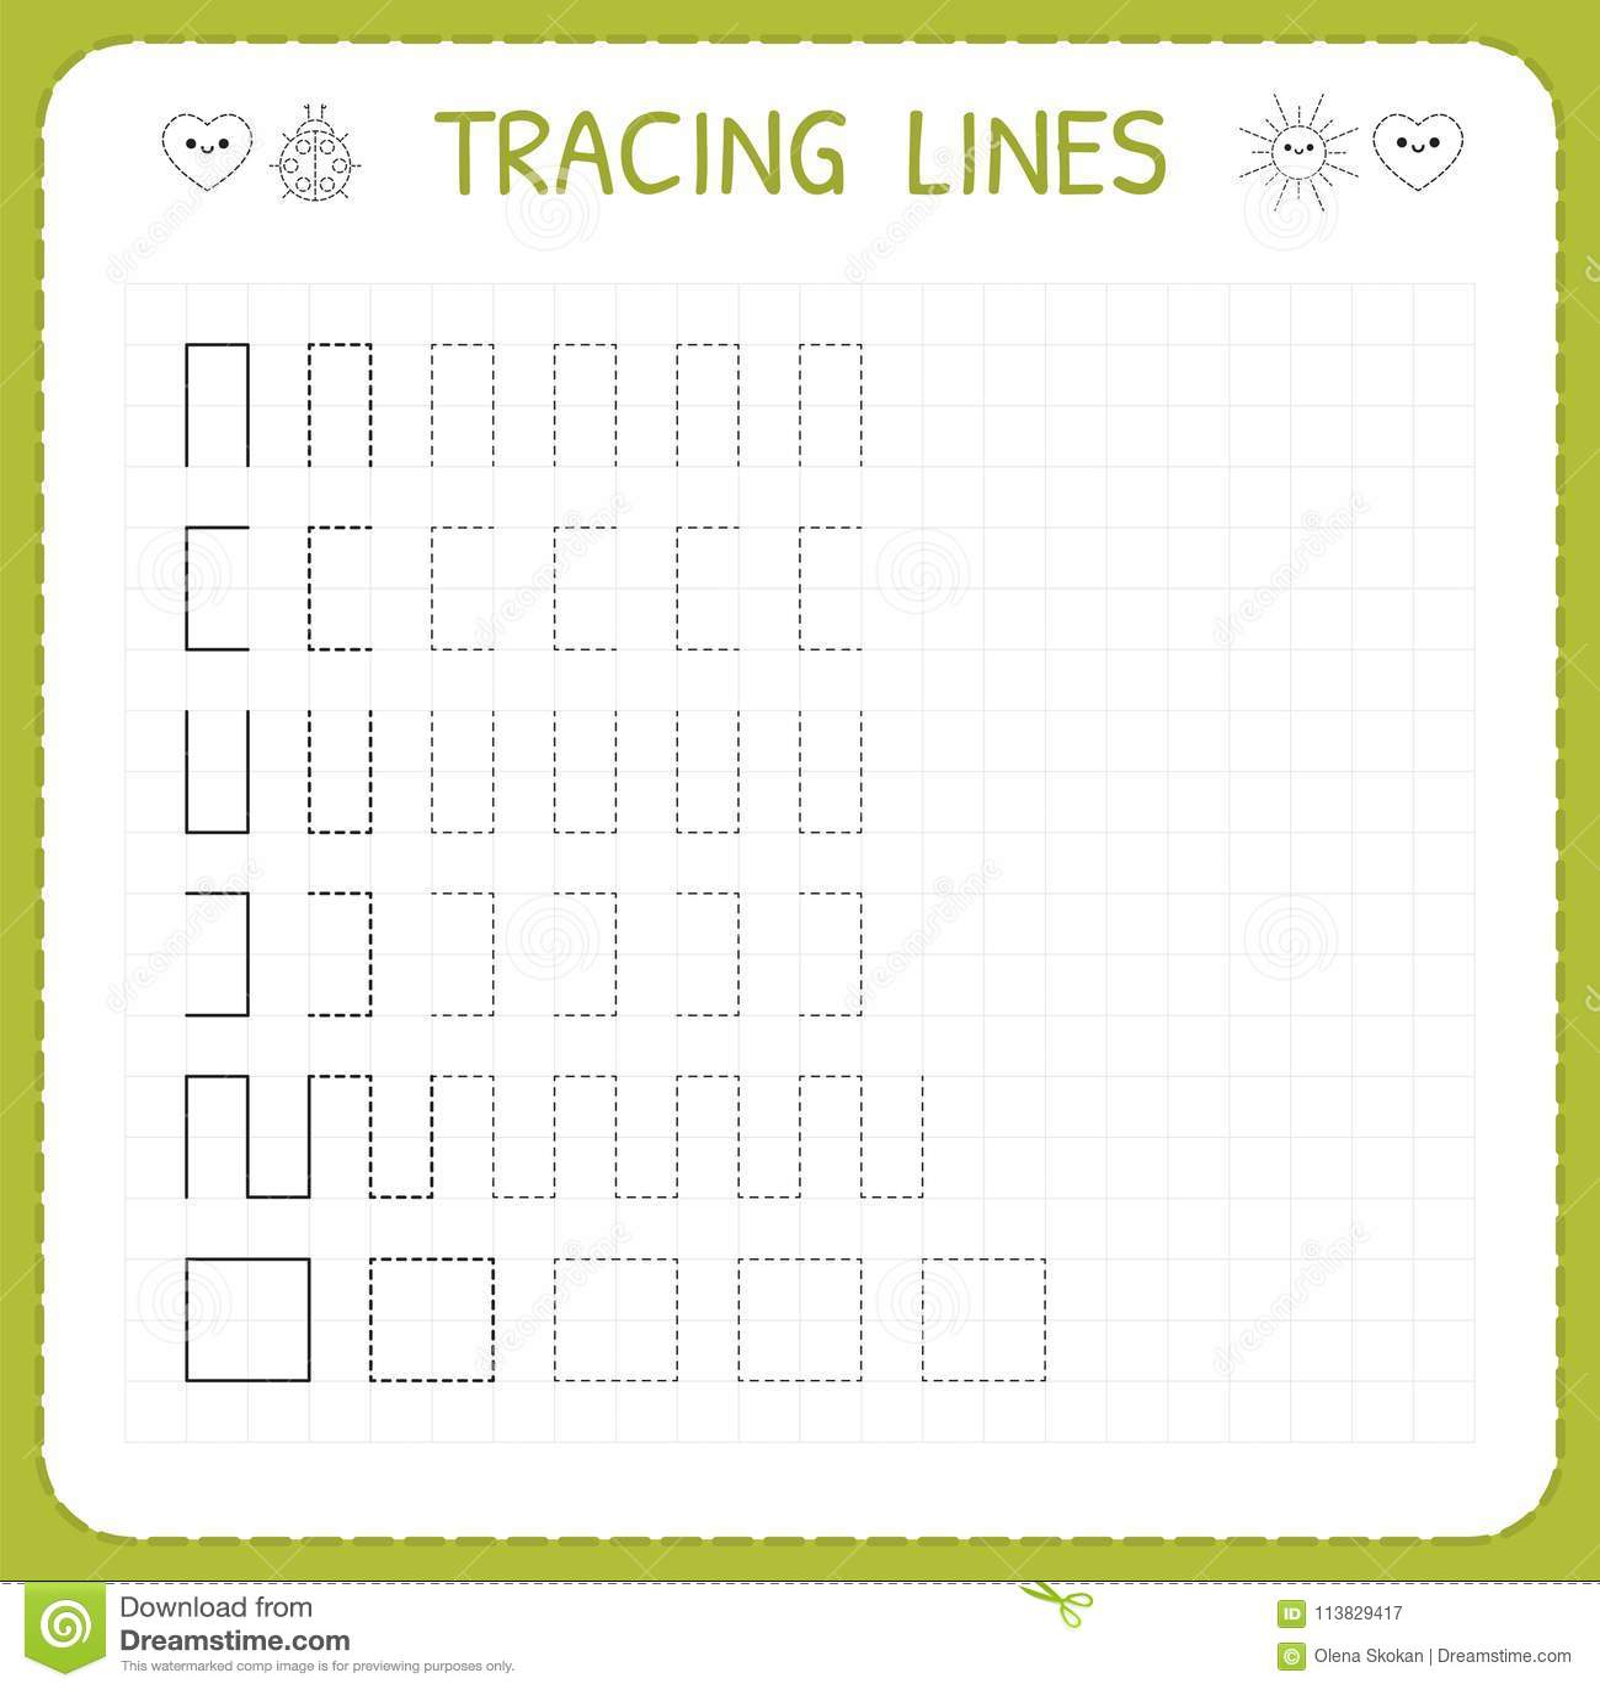 Tracing Lines Worksheet For Kids Working Pages For Children Preschool Or Kindergarten